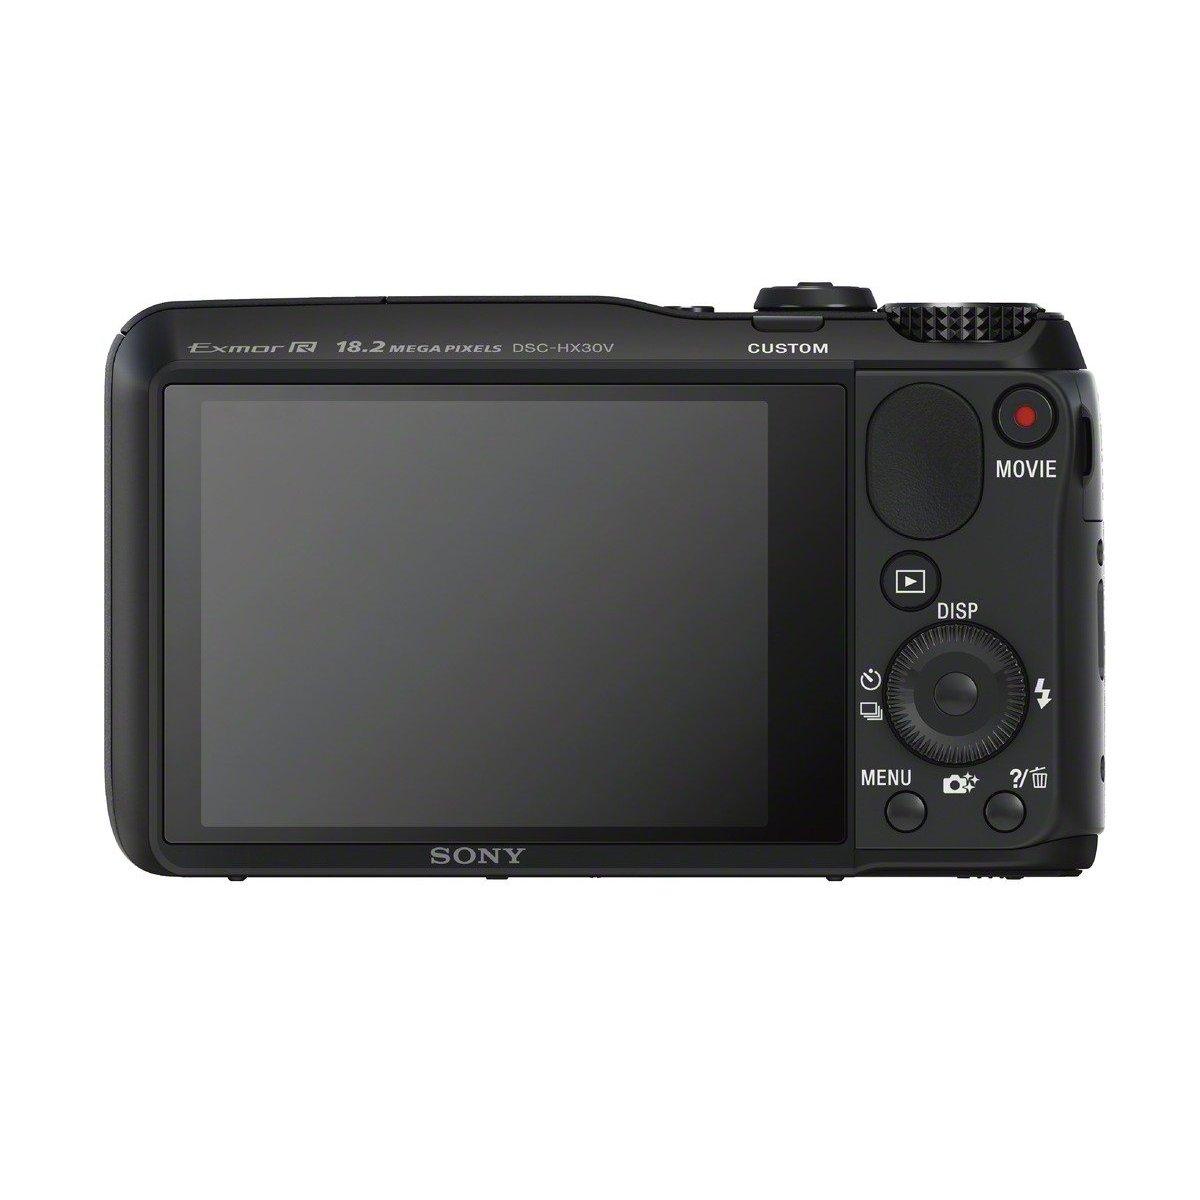 https://thetechjournal.com/wp-content/uploads/images/1203/1331279239-sony-cybershot-dschx30v-182-mp-exmor-r-cmos-digital-camera-11.jpg